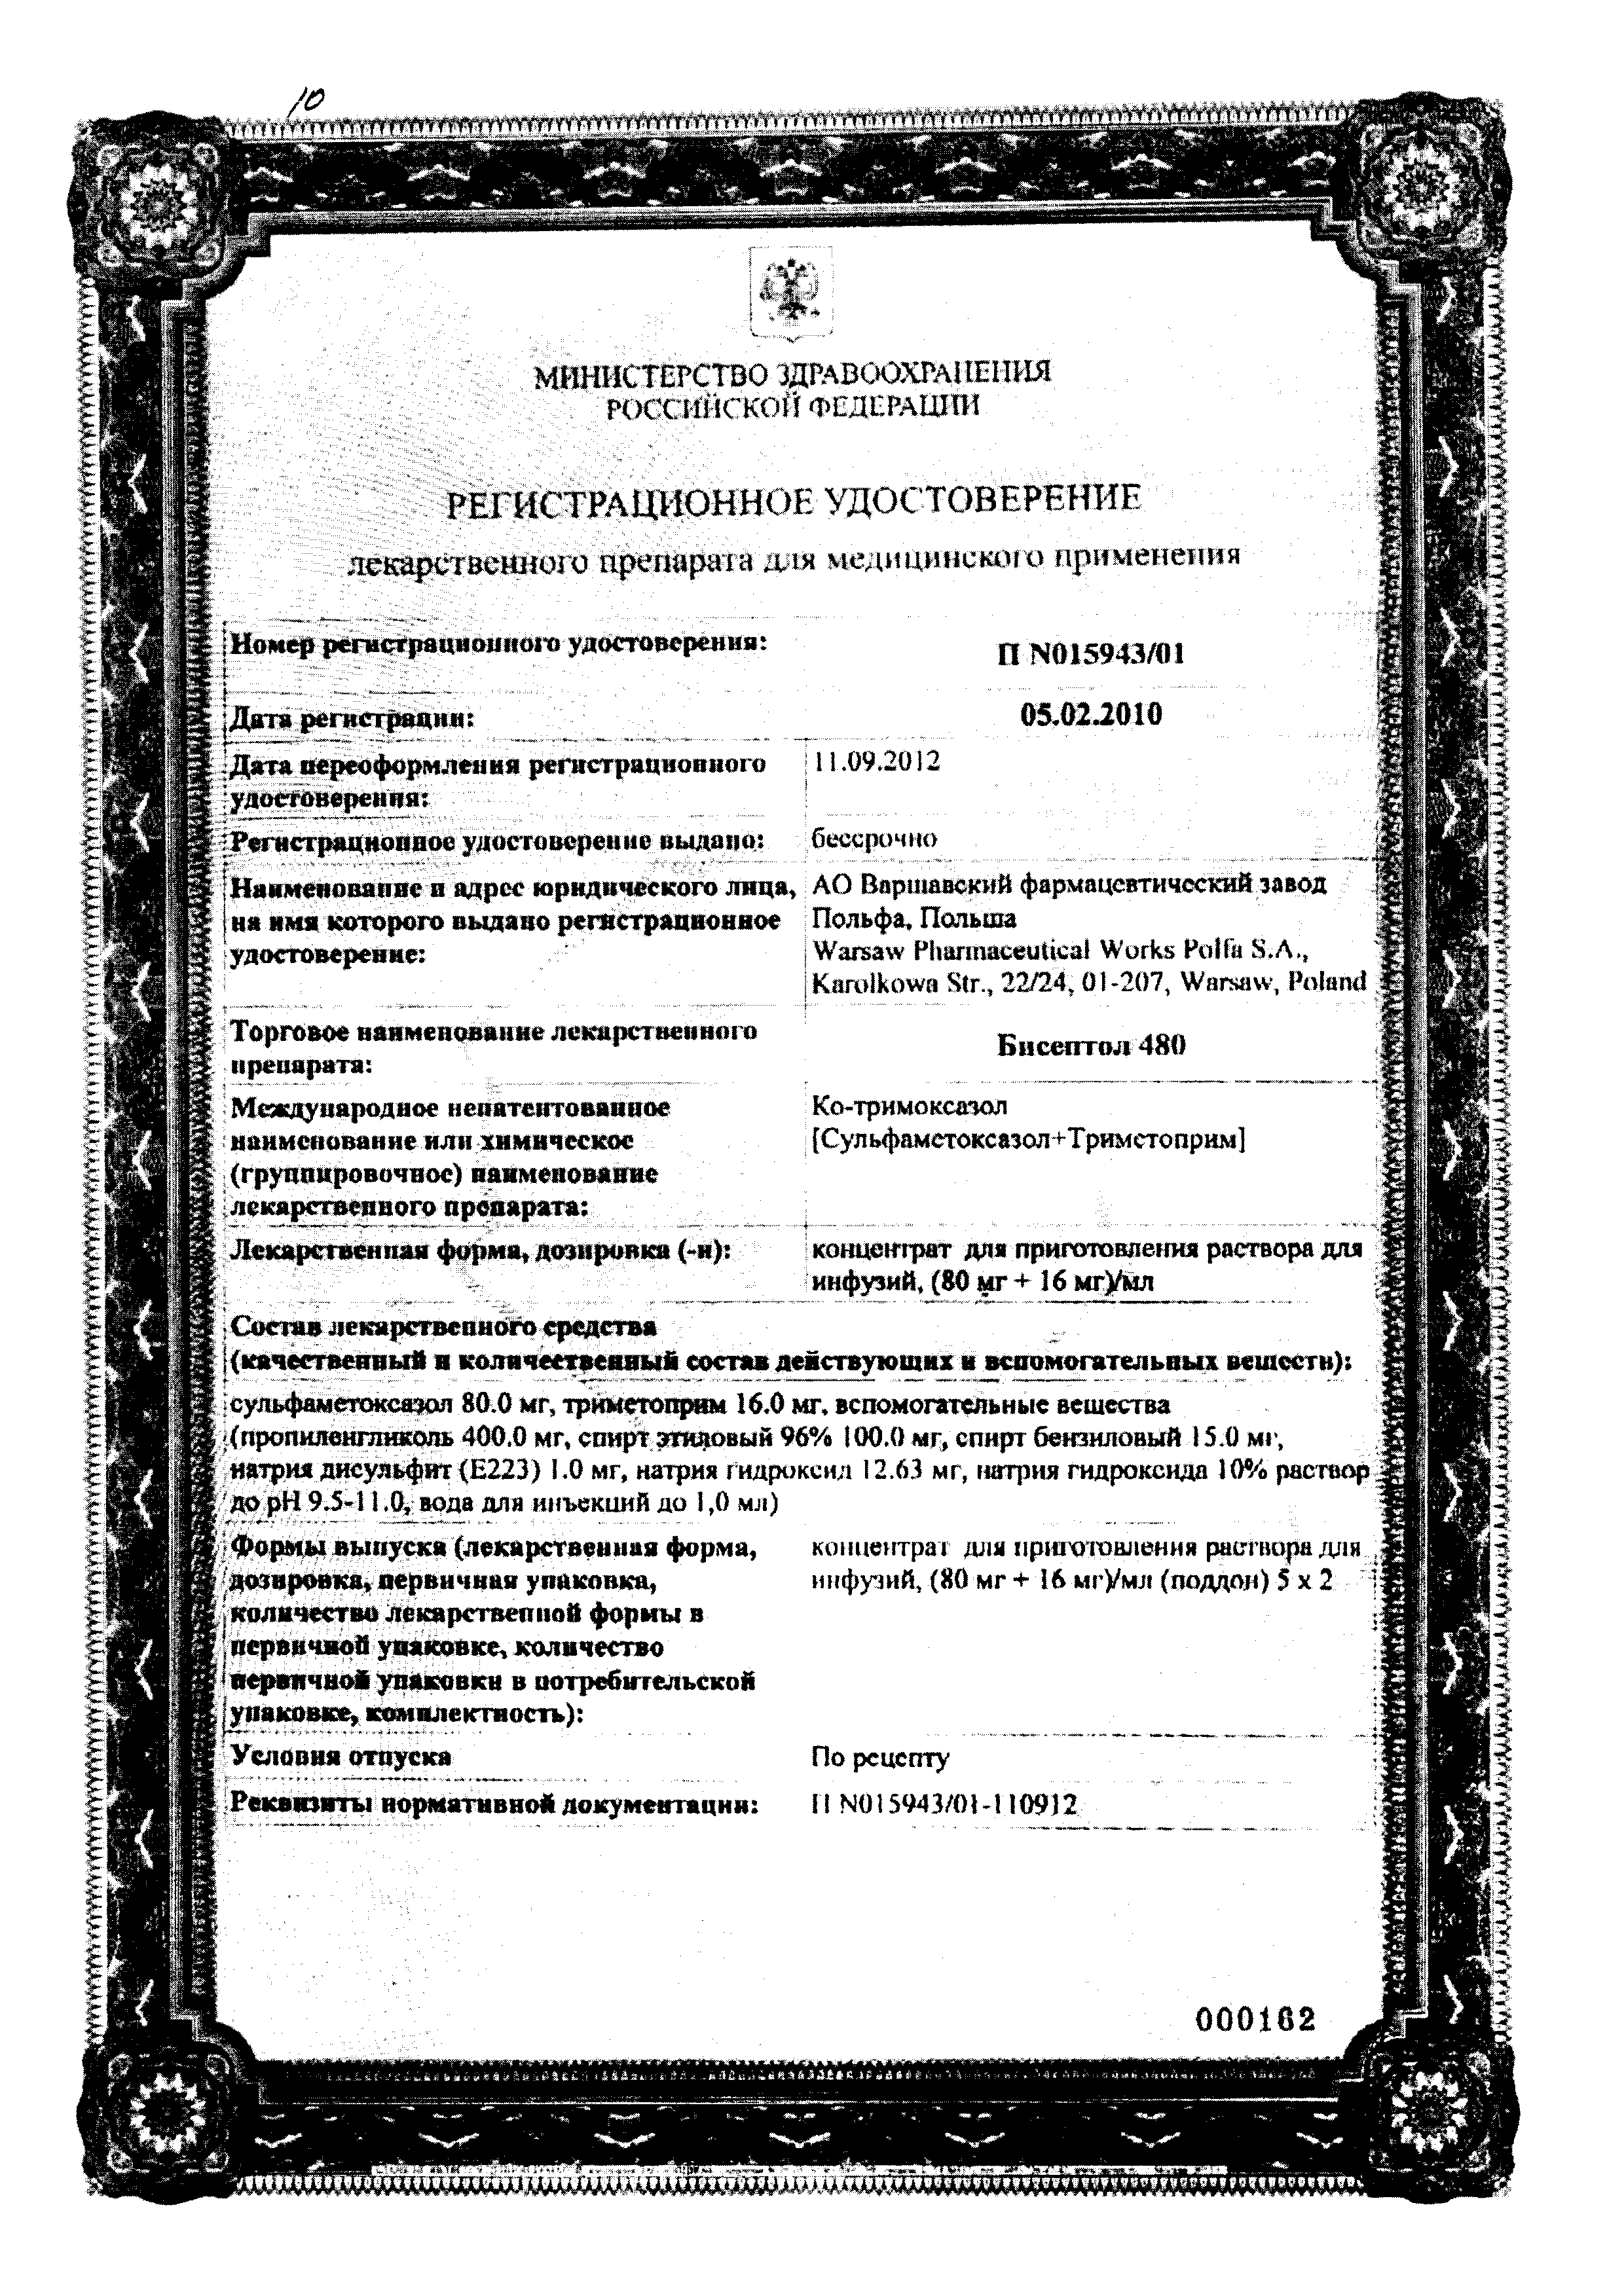 Бисептол 480 сертификат